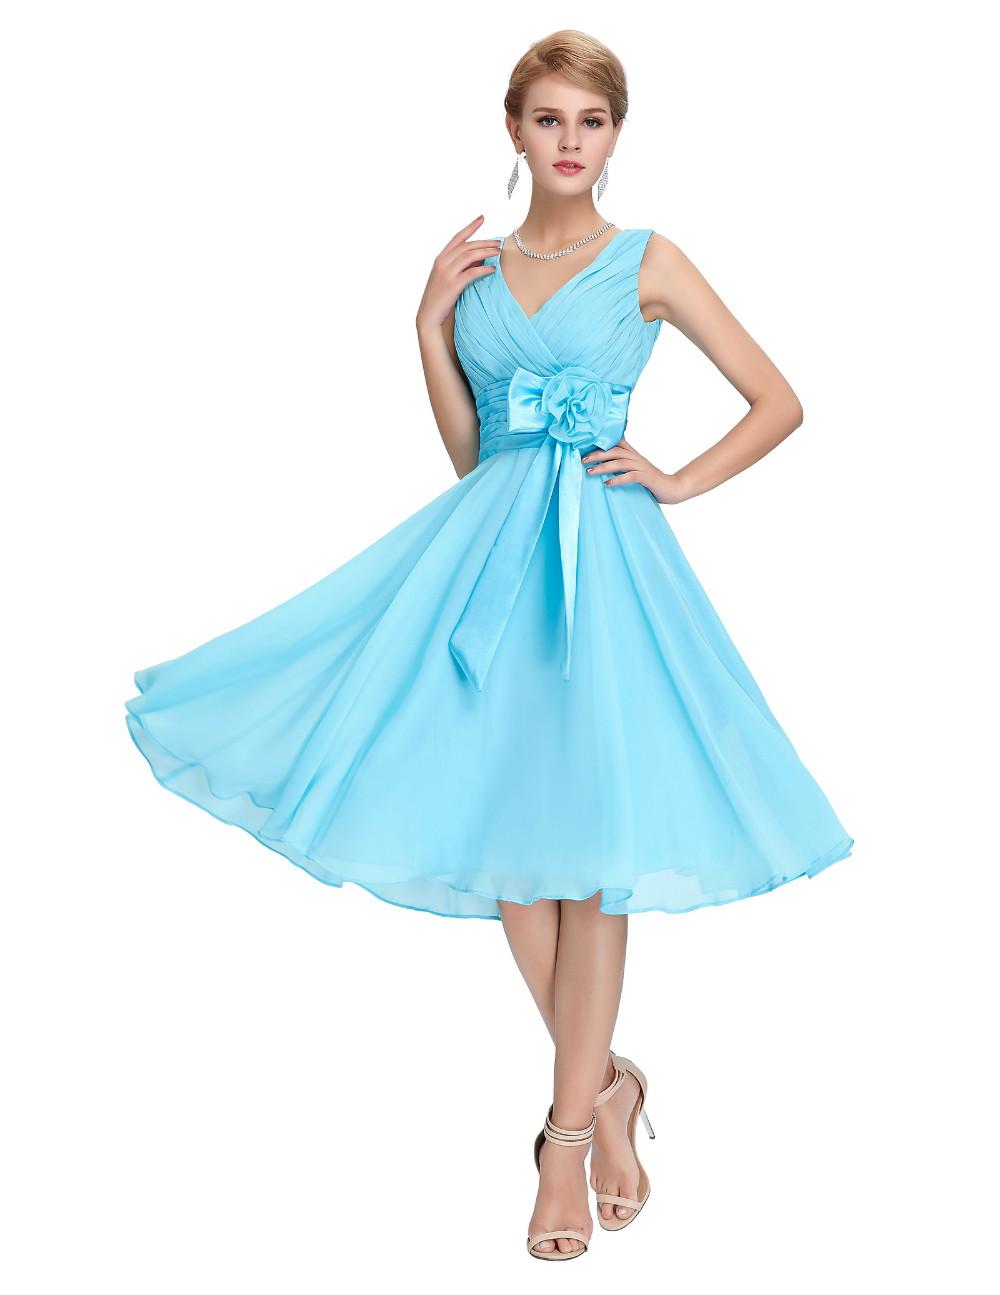 HTB1aO2MMVXXXXbfaXXXq6xXFXXXOKnee Length Short Chiffon Blue Dress